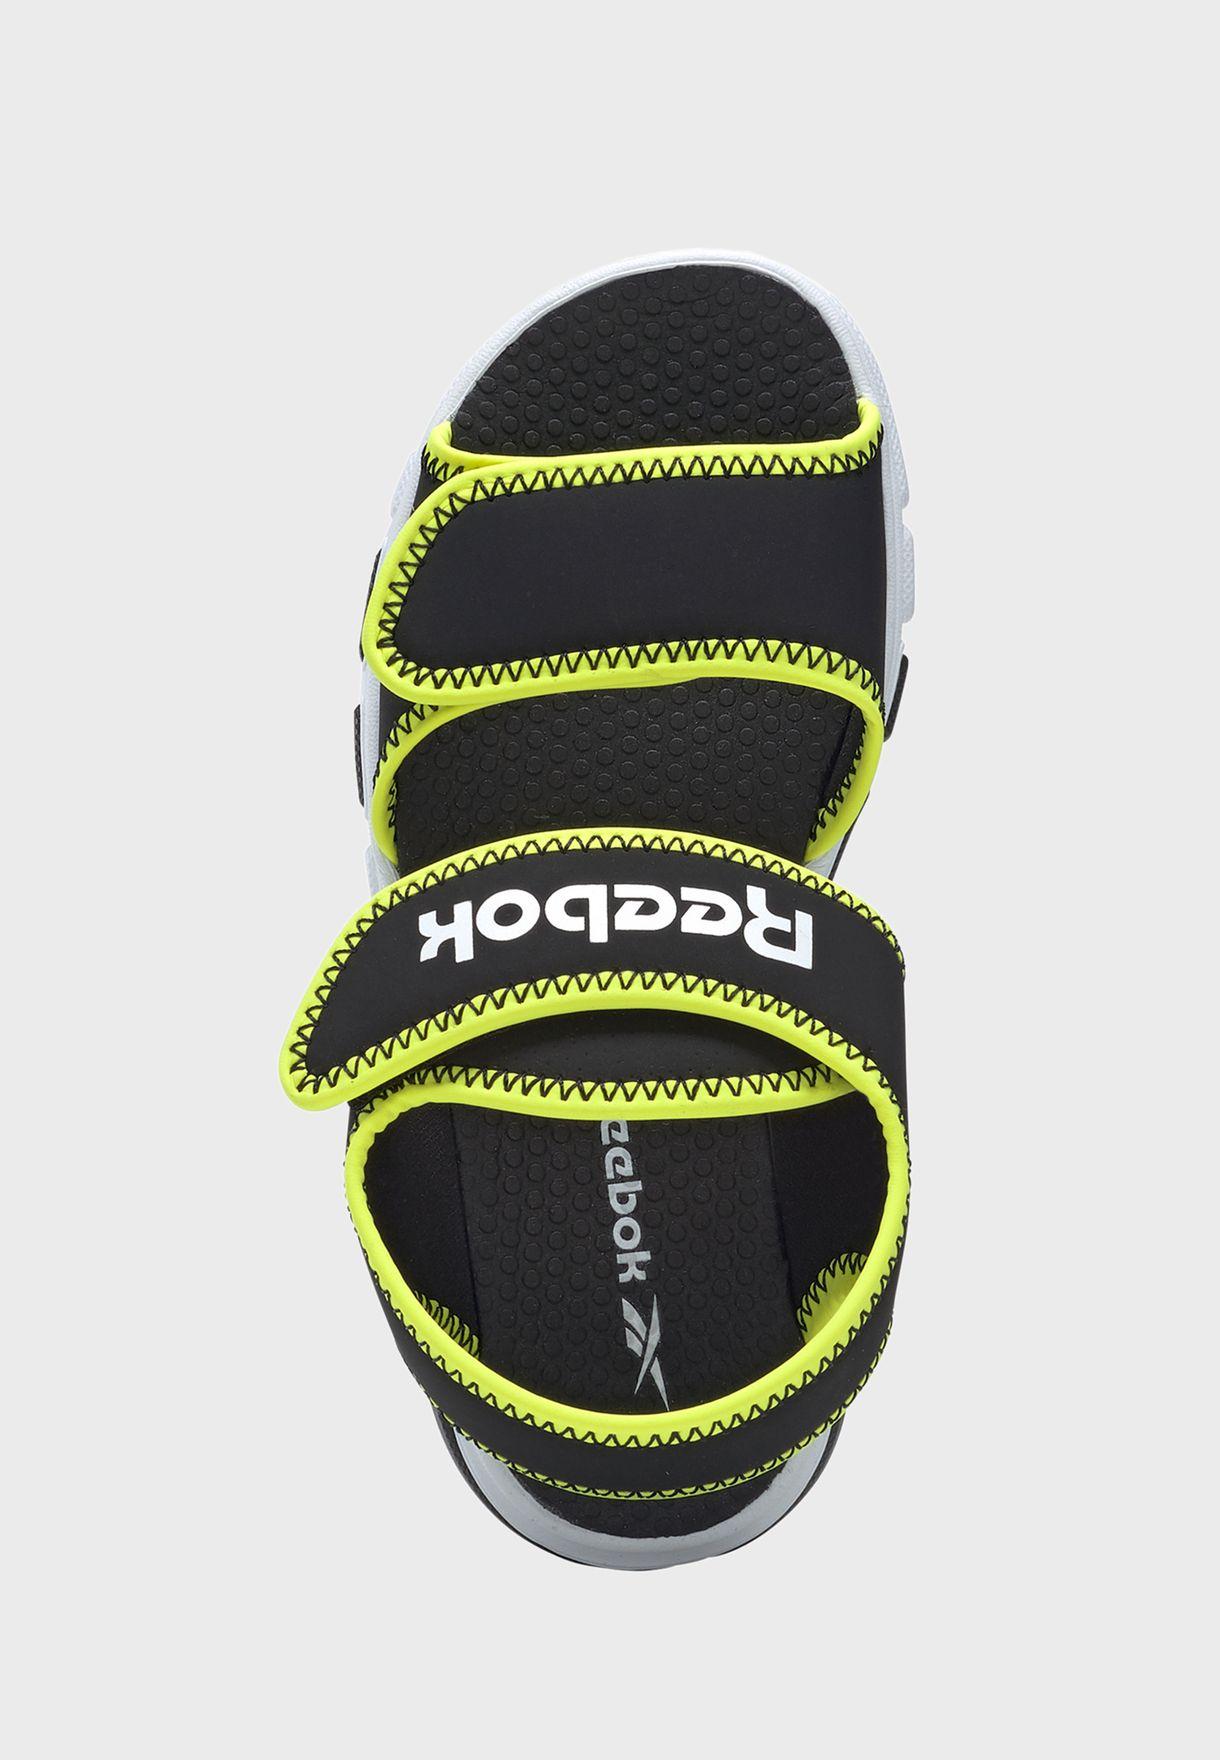 حذاء ويف جلايدر 3